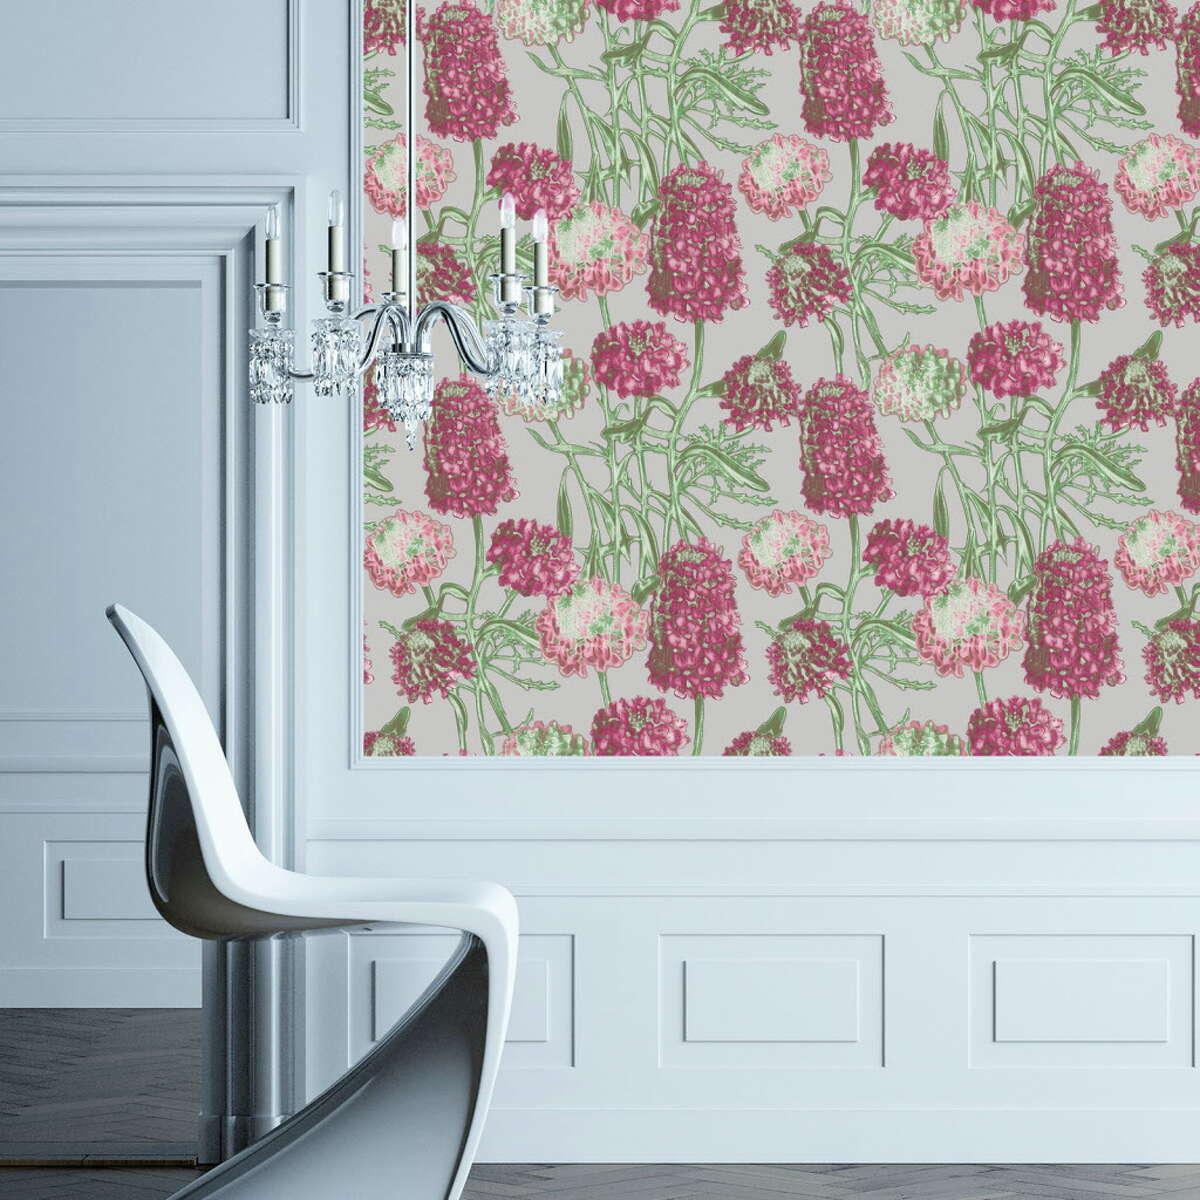 Tempaper's hydrangrea blush print, $98/square foot, tempaperdesigns.com